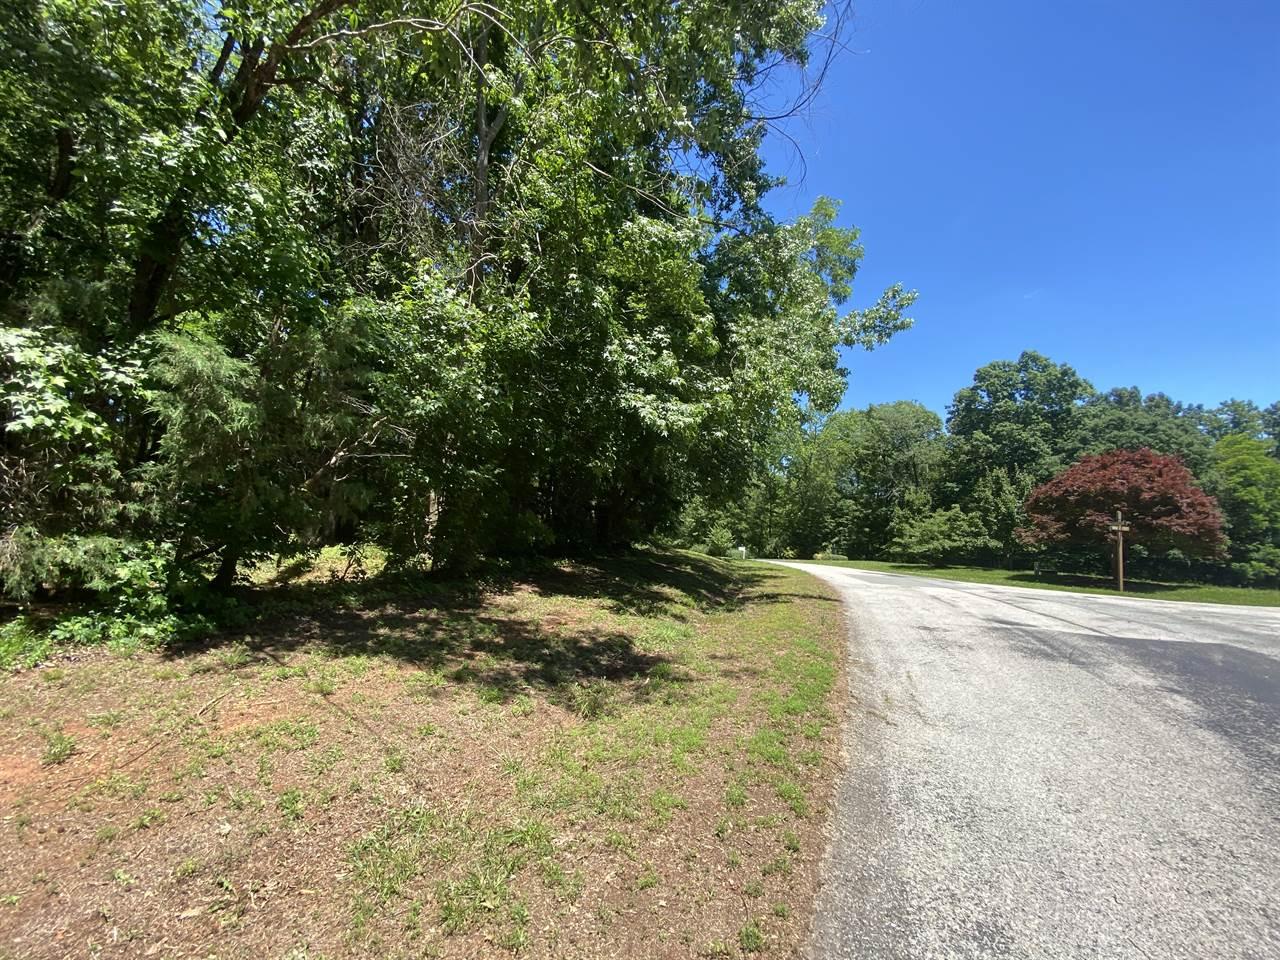 Lot 33 Buckhead Drive, Bracey, VA 23919